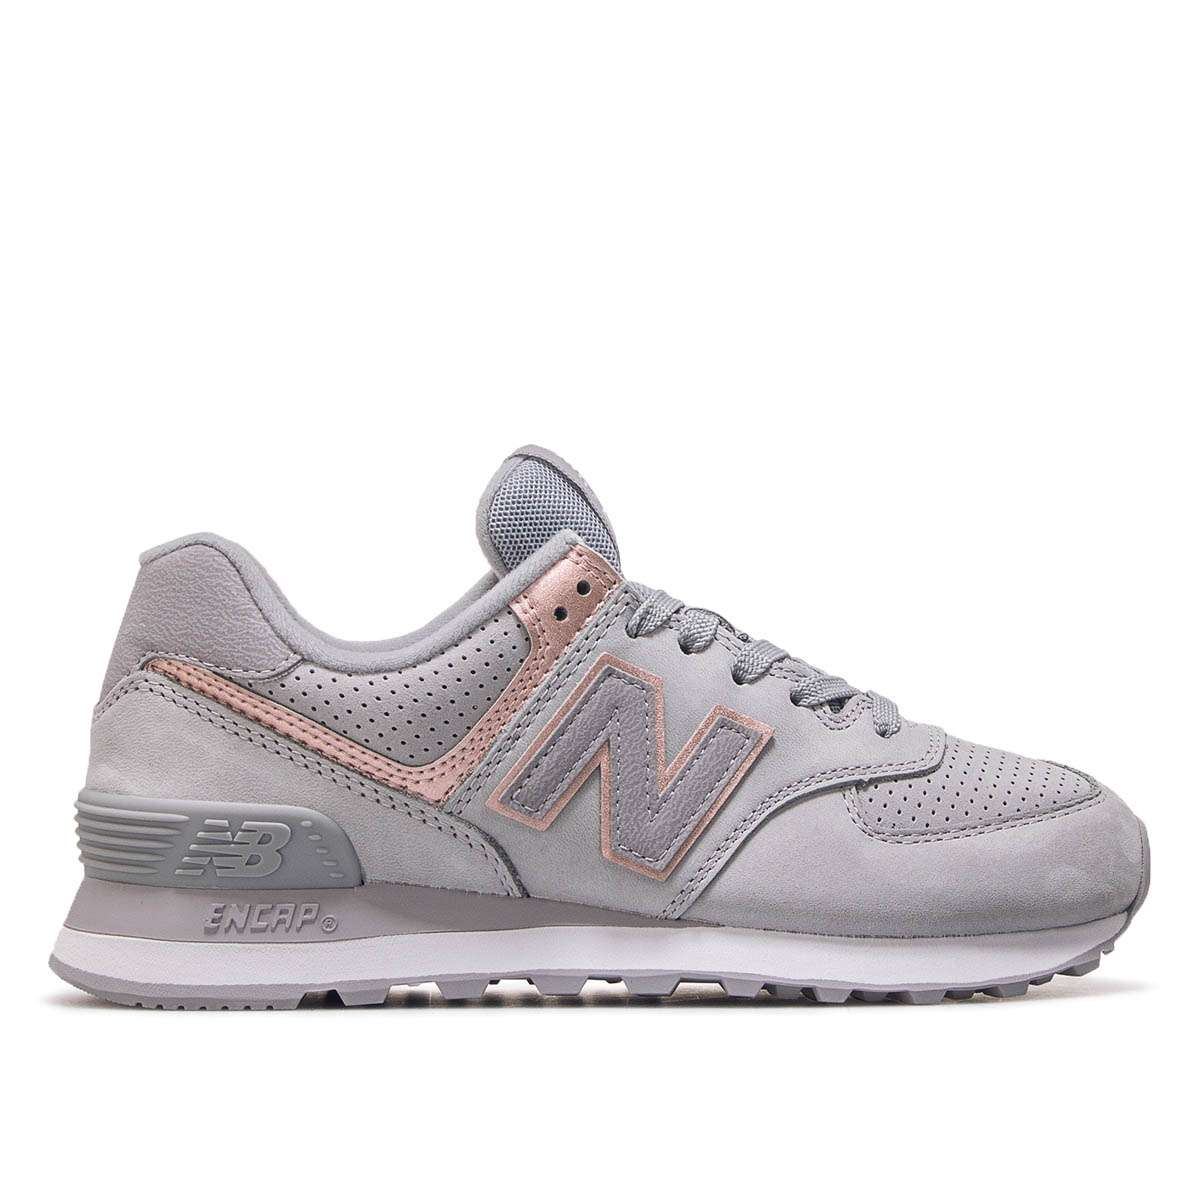 70b50a895a grauen Damen Sneaker von New Balance online kaufen | BodycheckSneaker |  Frauen | Schuhe | Bodycheck